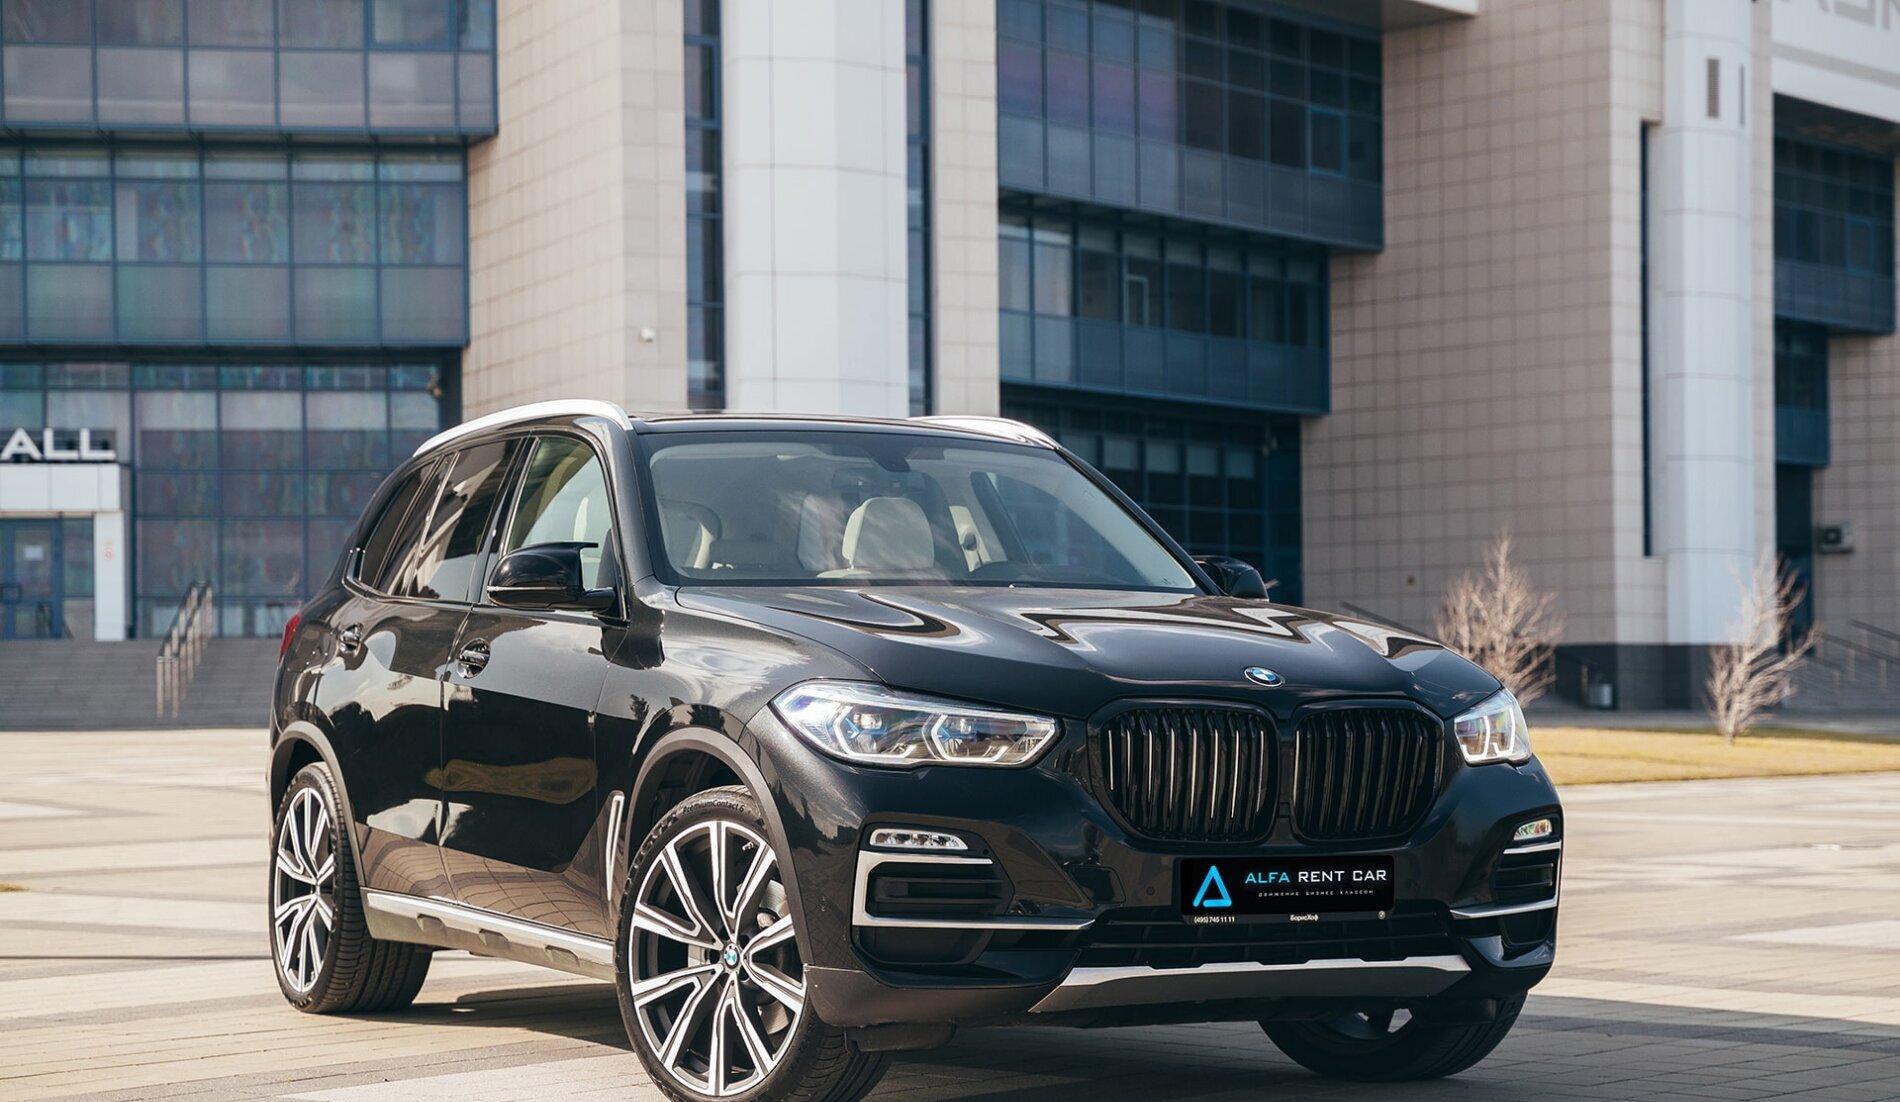 BMW X5 40-d New